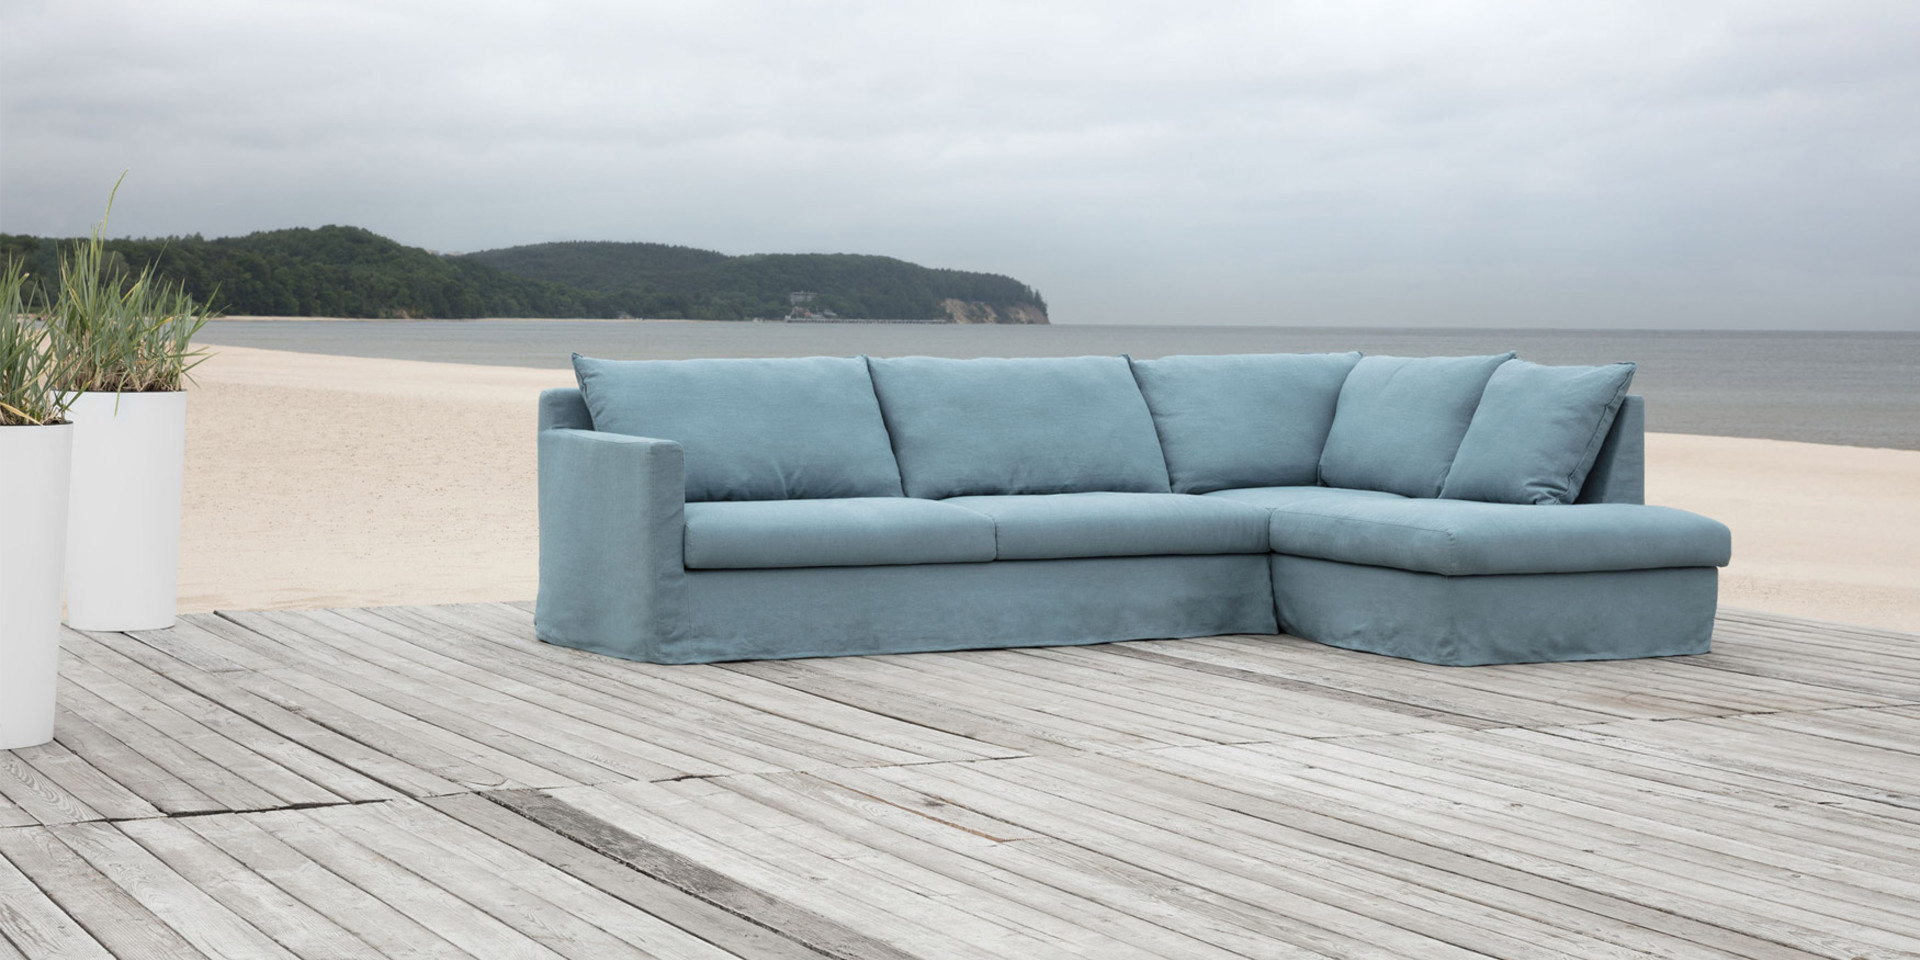 SALLY_arrangement_set2_big_cushions_linenP823_8_slate_3